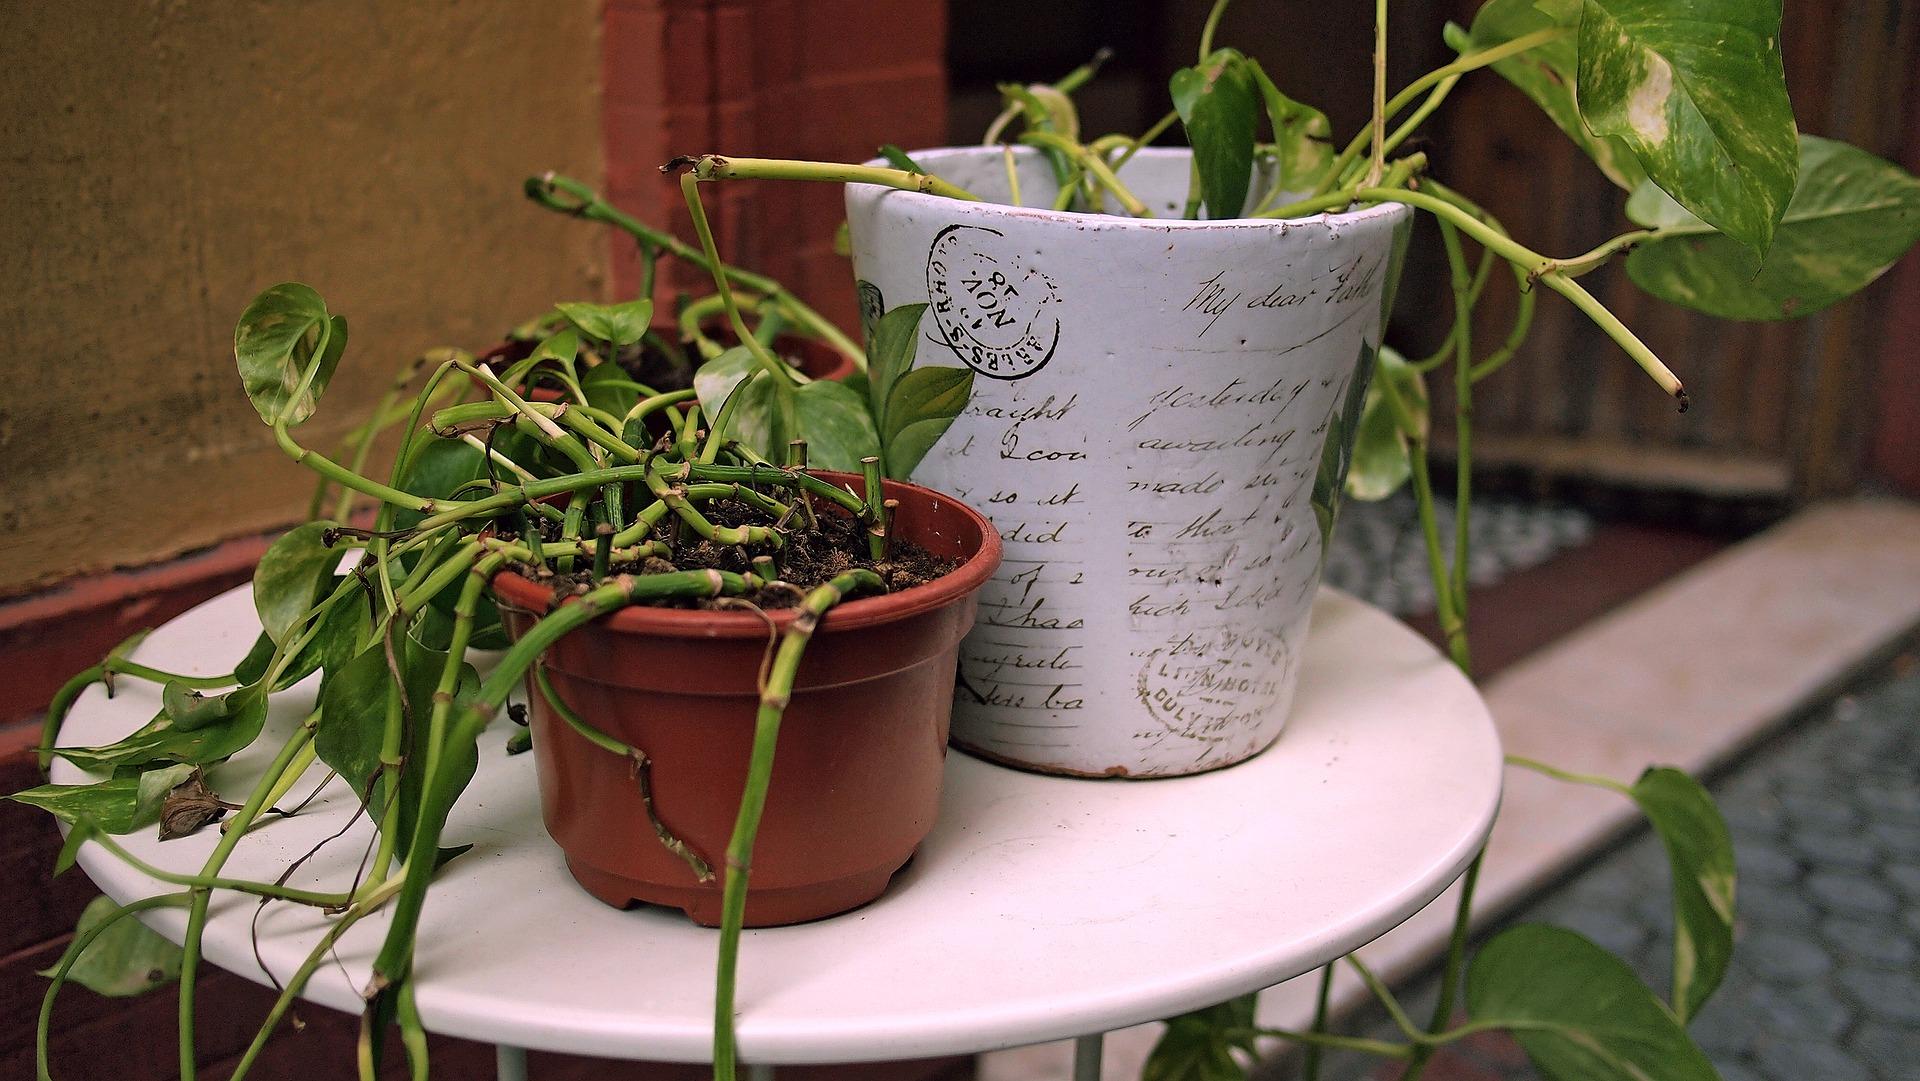 plants-1629206_1920